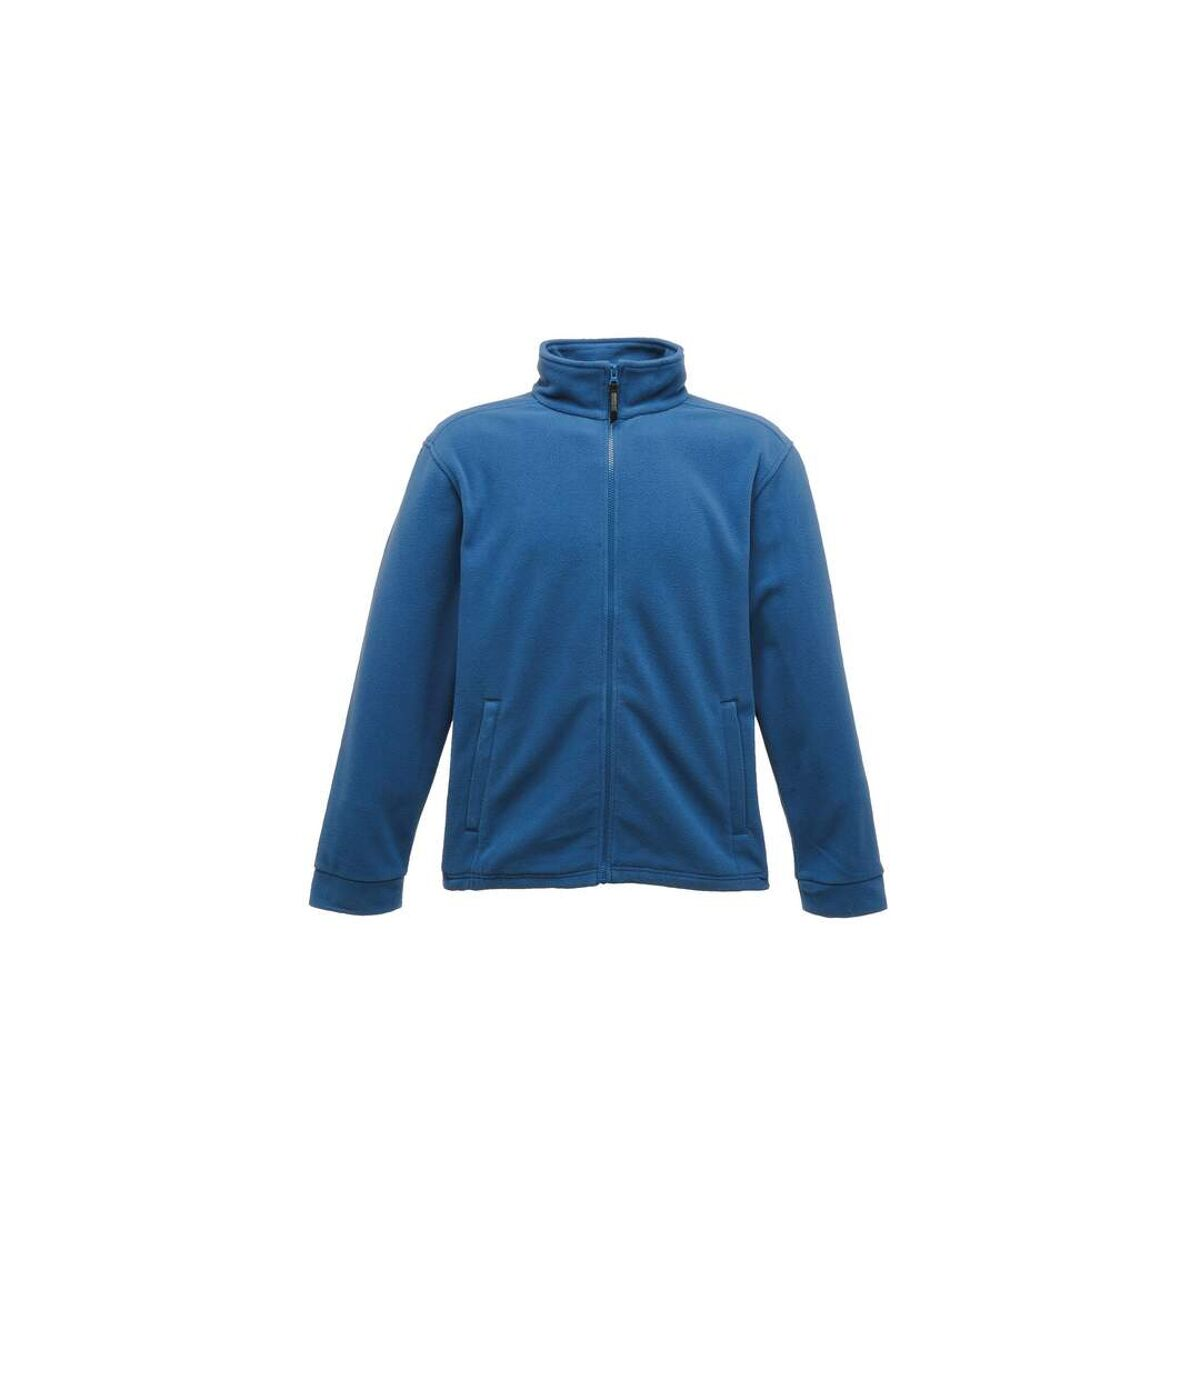 Regatta Mens Classic Fleece (Royal Blue) - UTRG1623